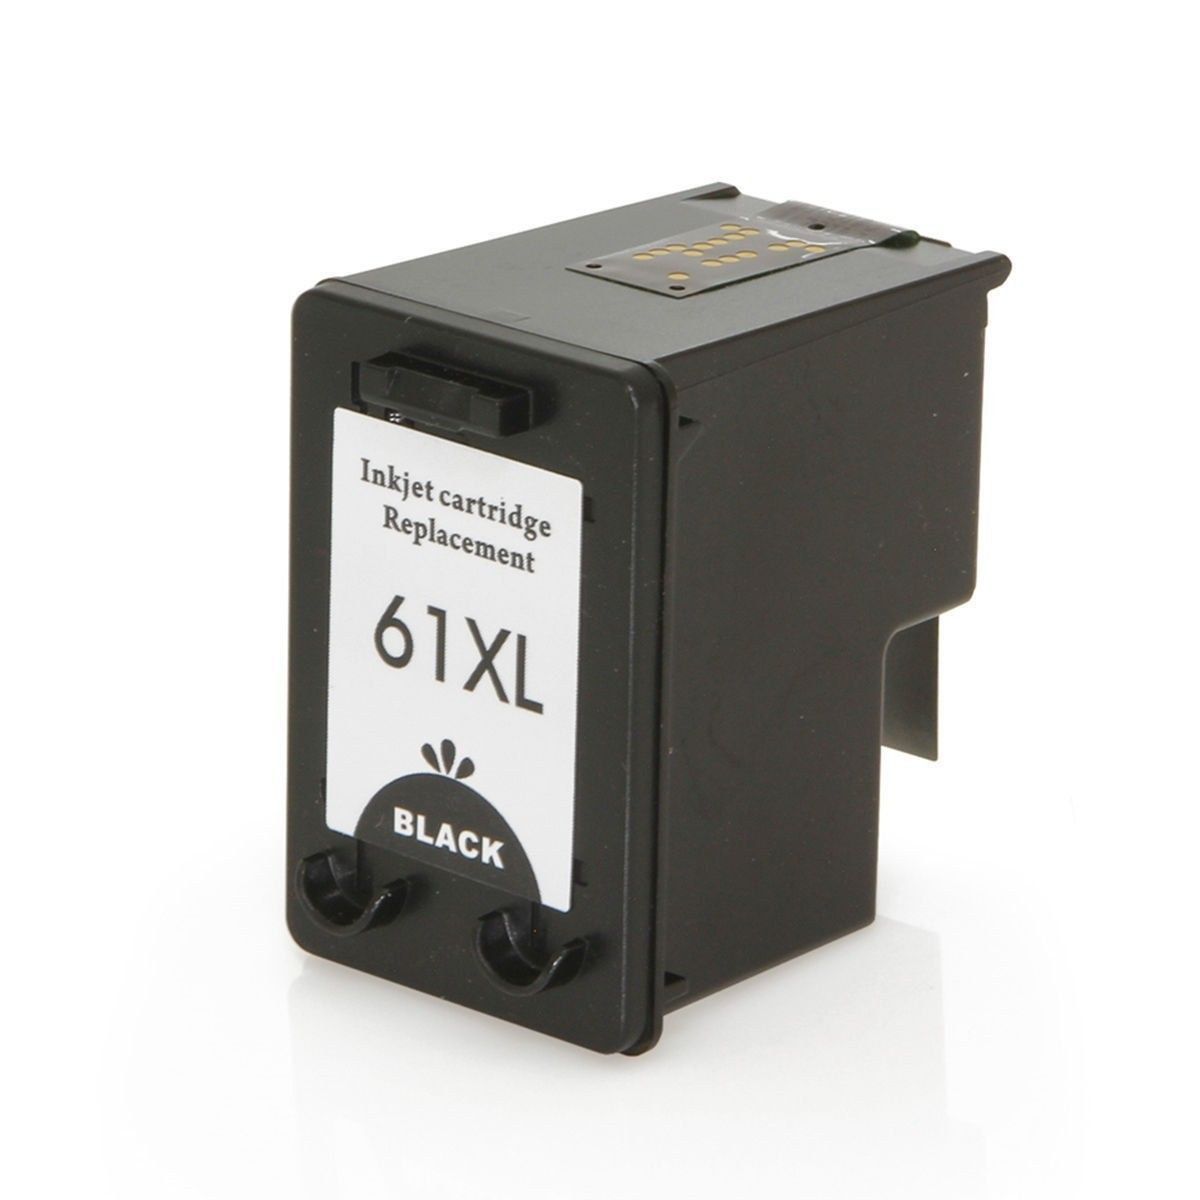 Compatível: Cartucho de Tinta 61xl 61 para HP 1000 J110a 1050 J410a J410e 1051 1010 2000 2050 J510a / Preto / 12ml